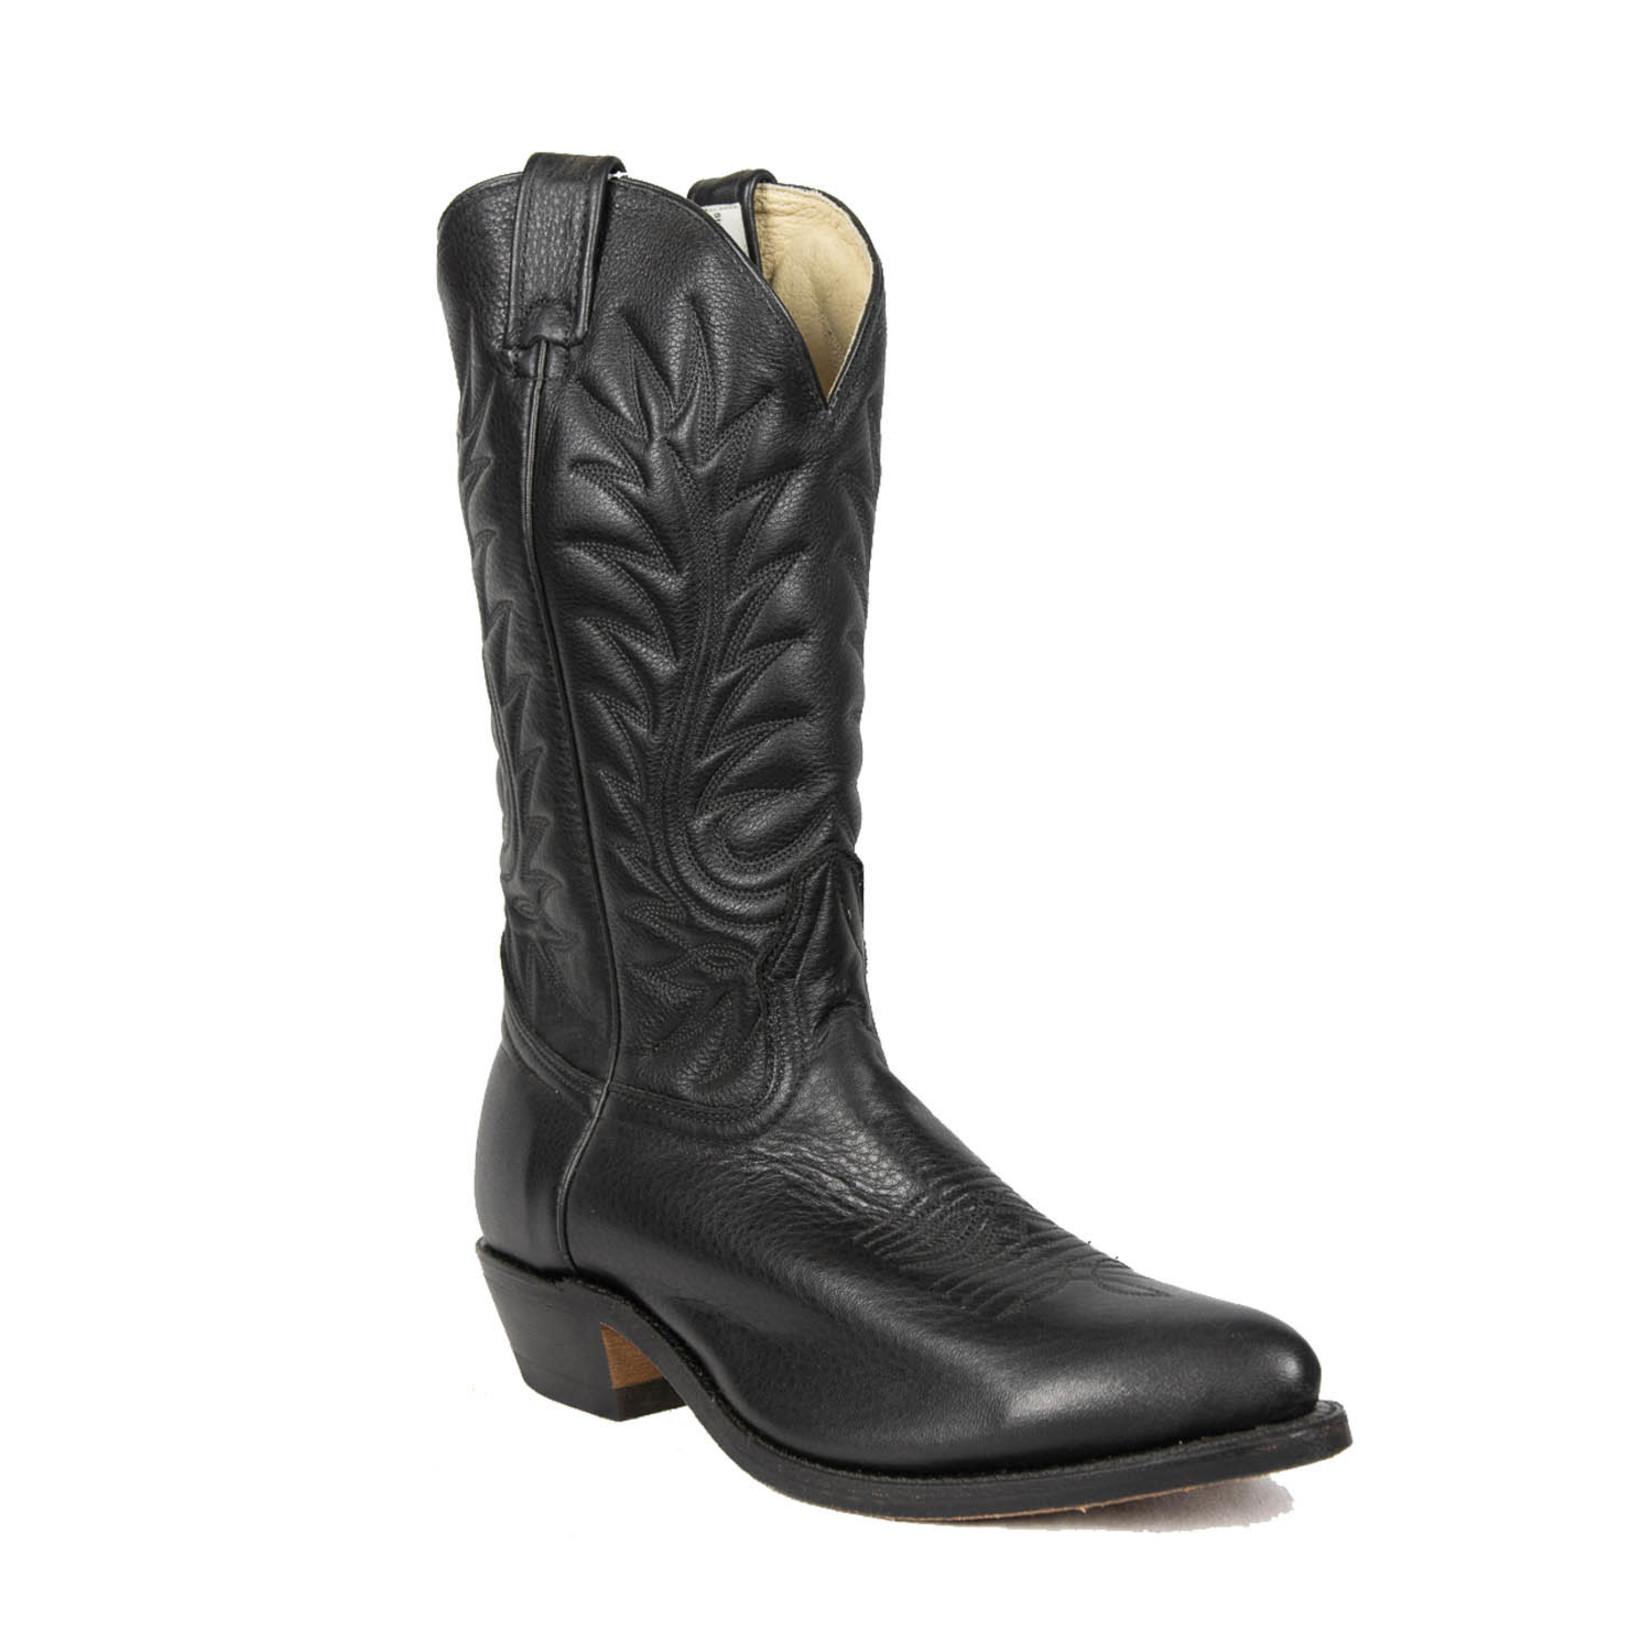 Canada West Canada West Black Manchester 6821 cowboy Boot